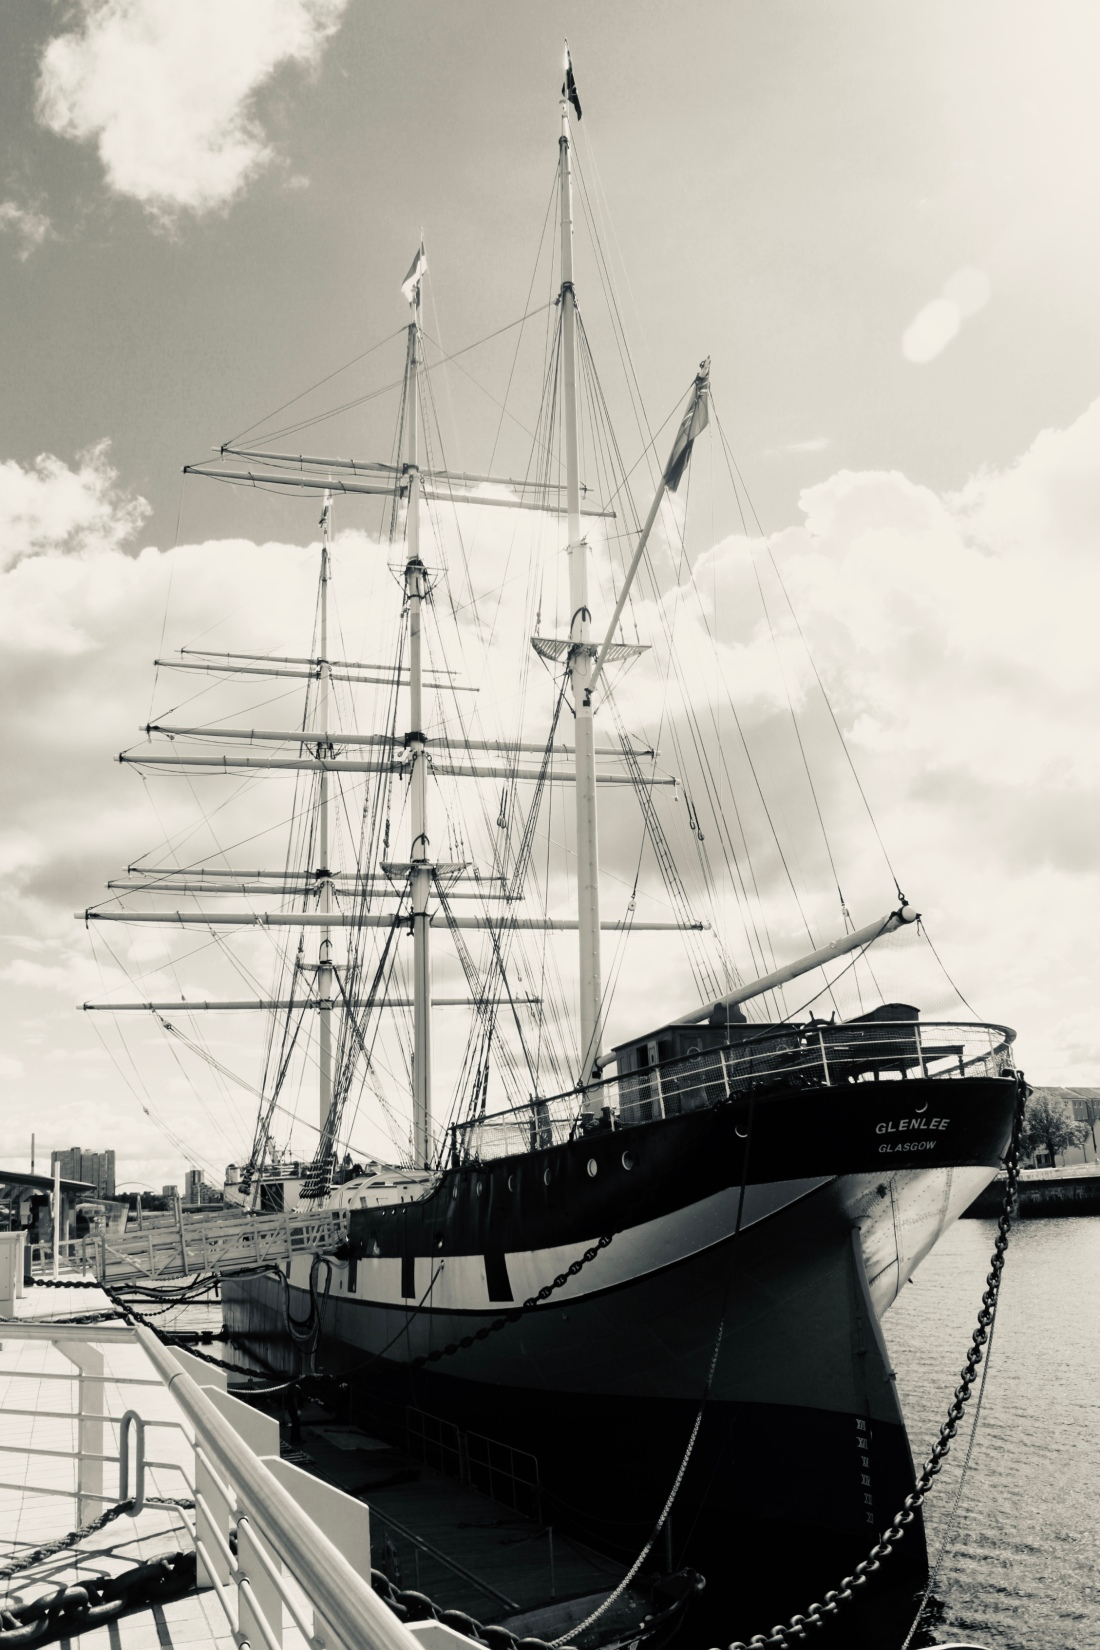 The Glen Lee aka the Tall Ship by Jez Braithwaite